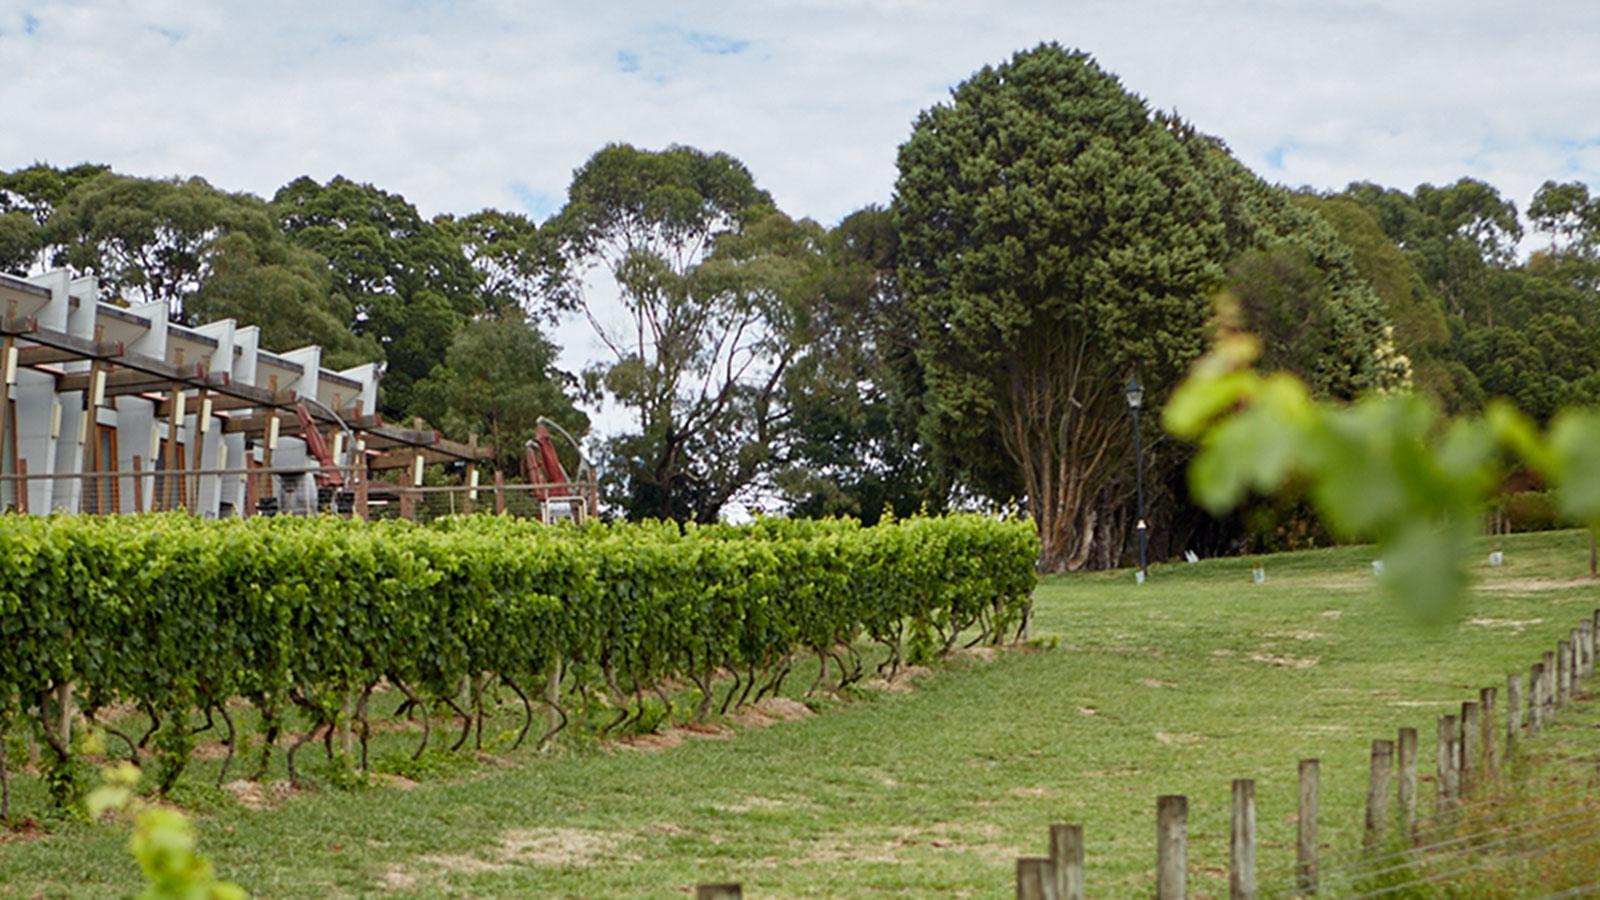 Hogget Kitchen at Wild Dog Winery, Gippsland, Victoria, Australia